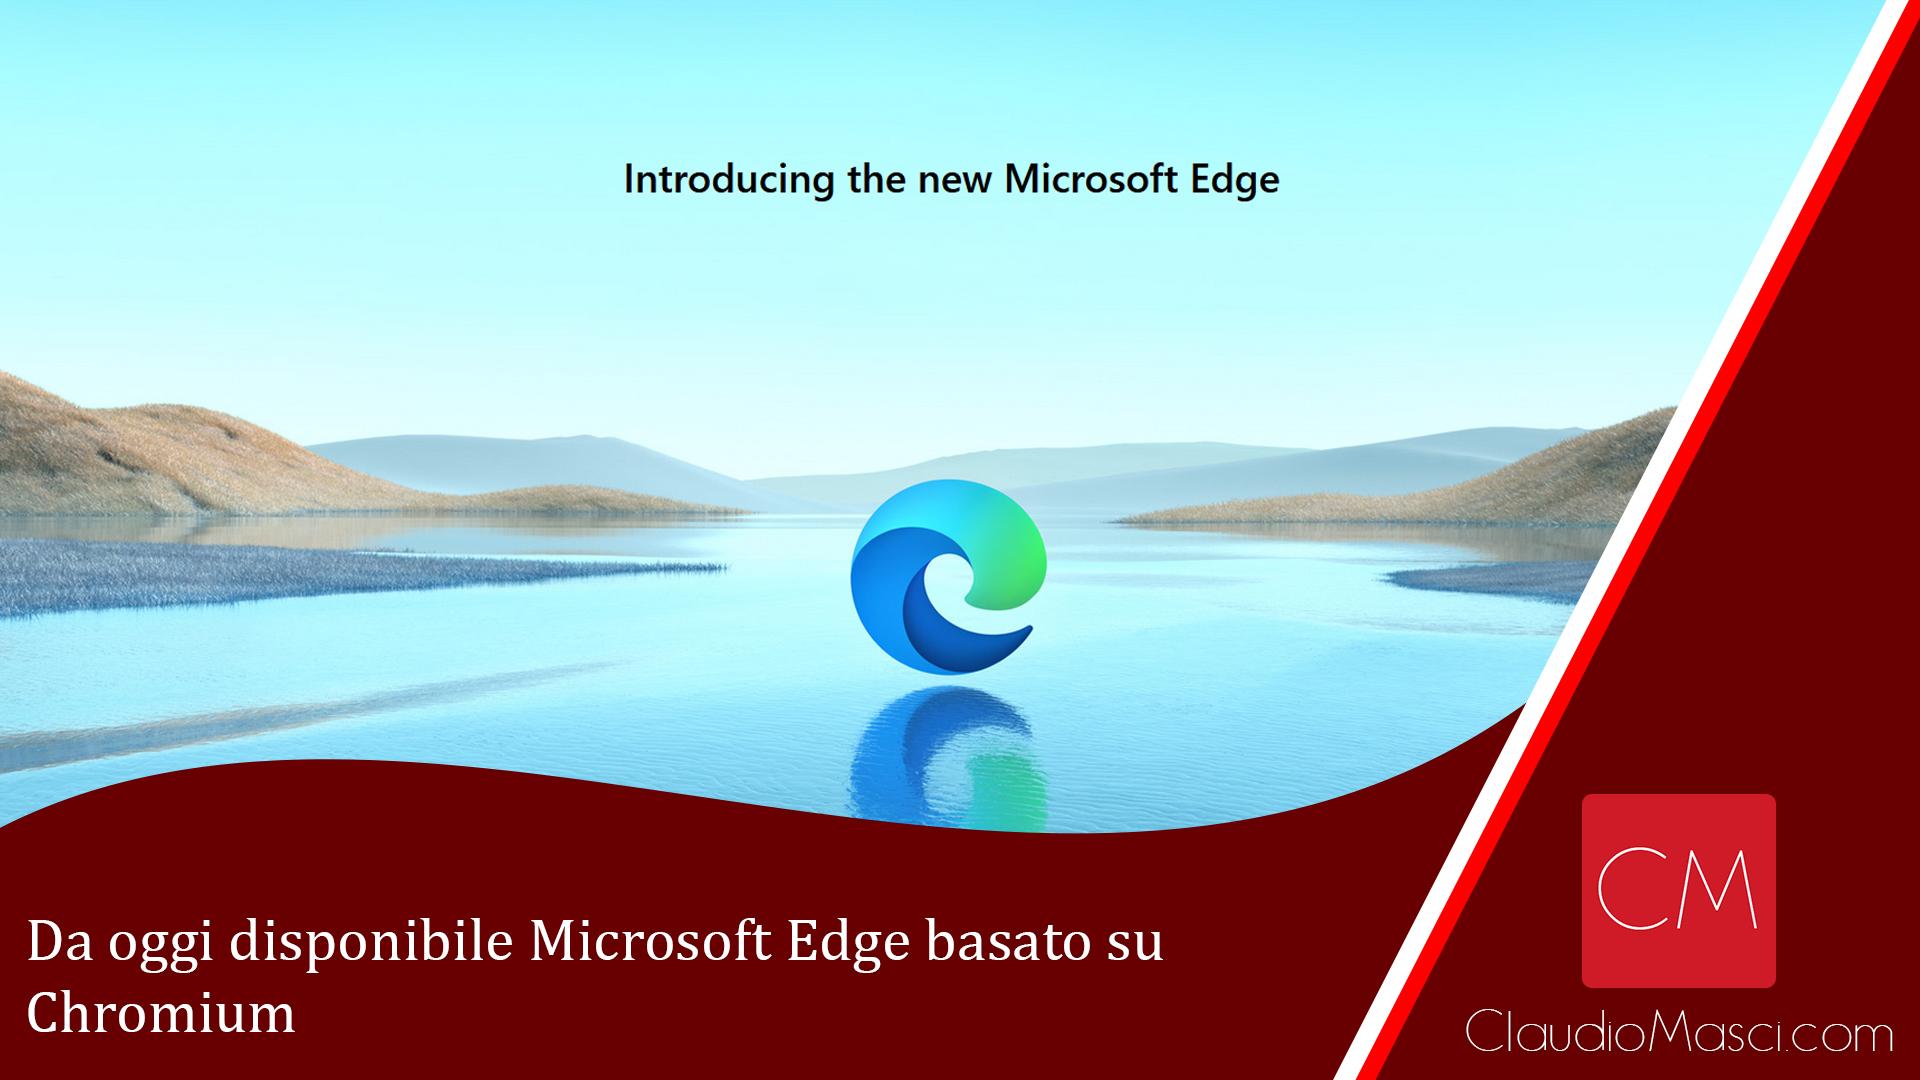 Da oggi disponibile Microsoft Edge basato su Chromium